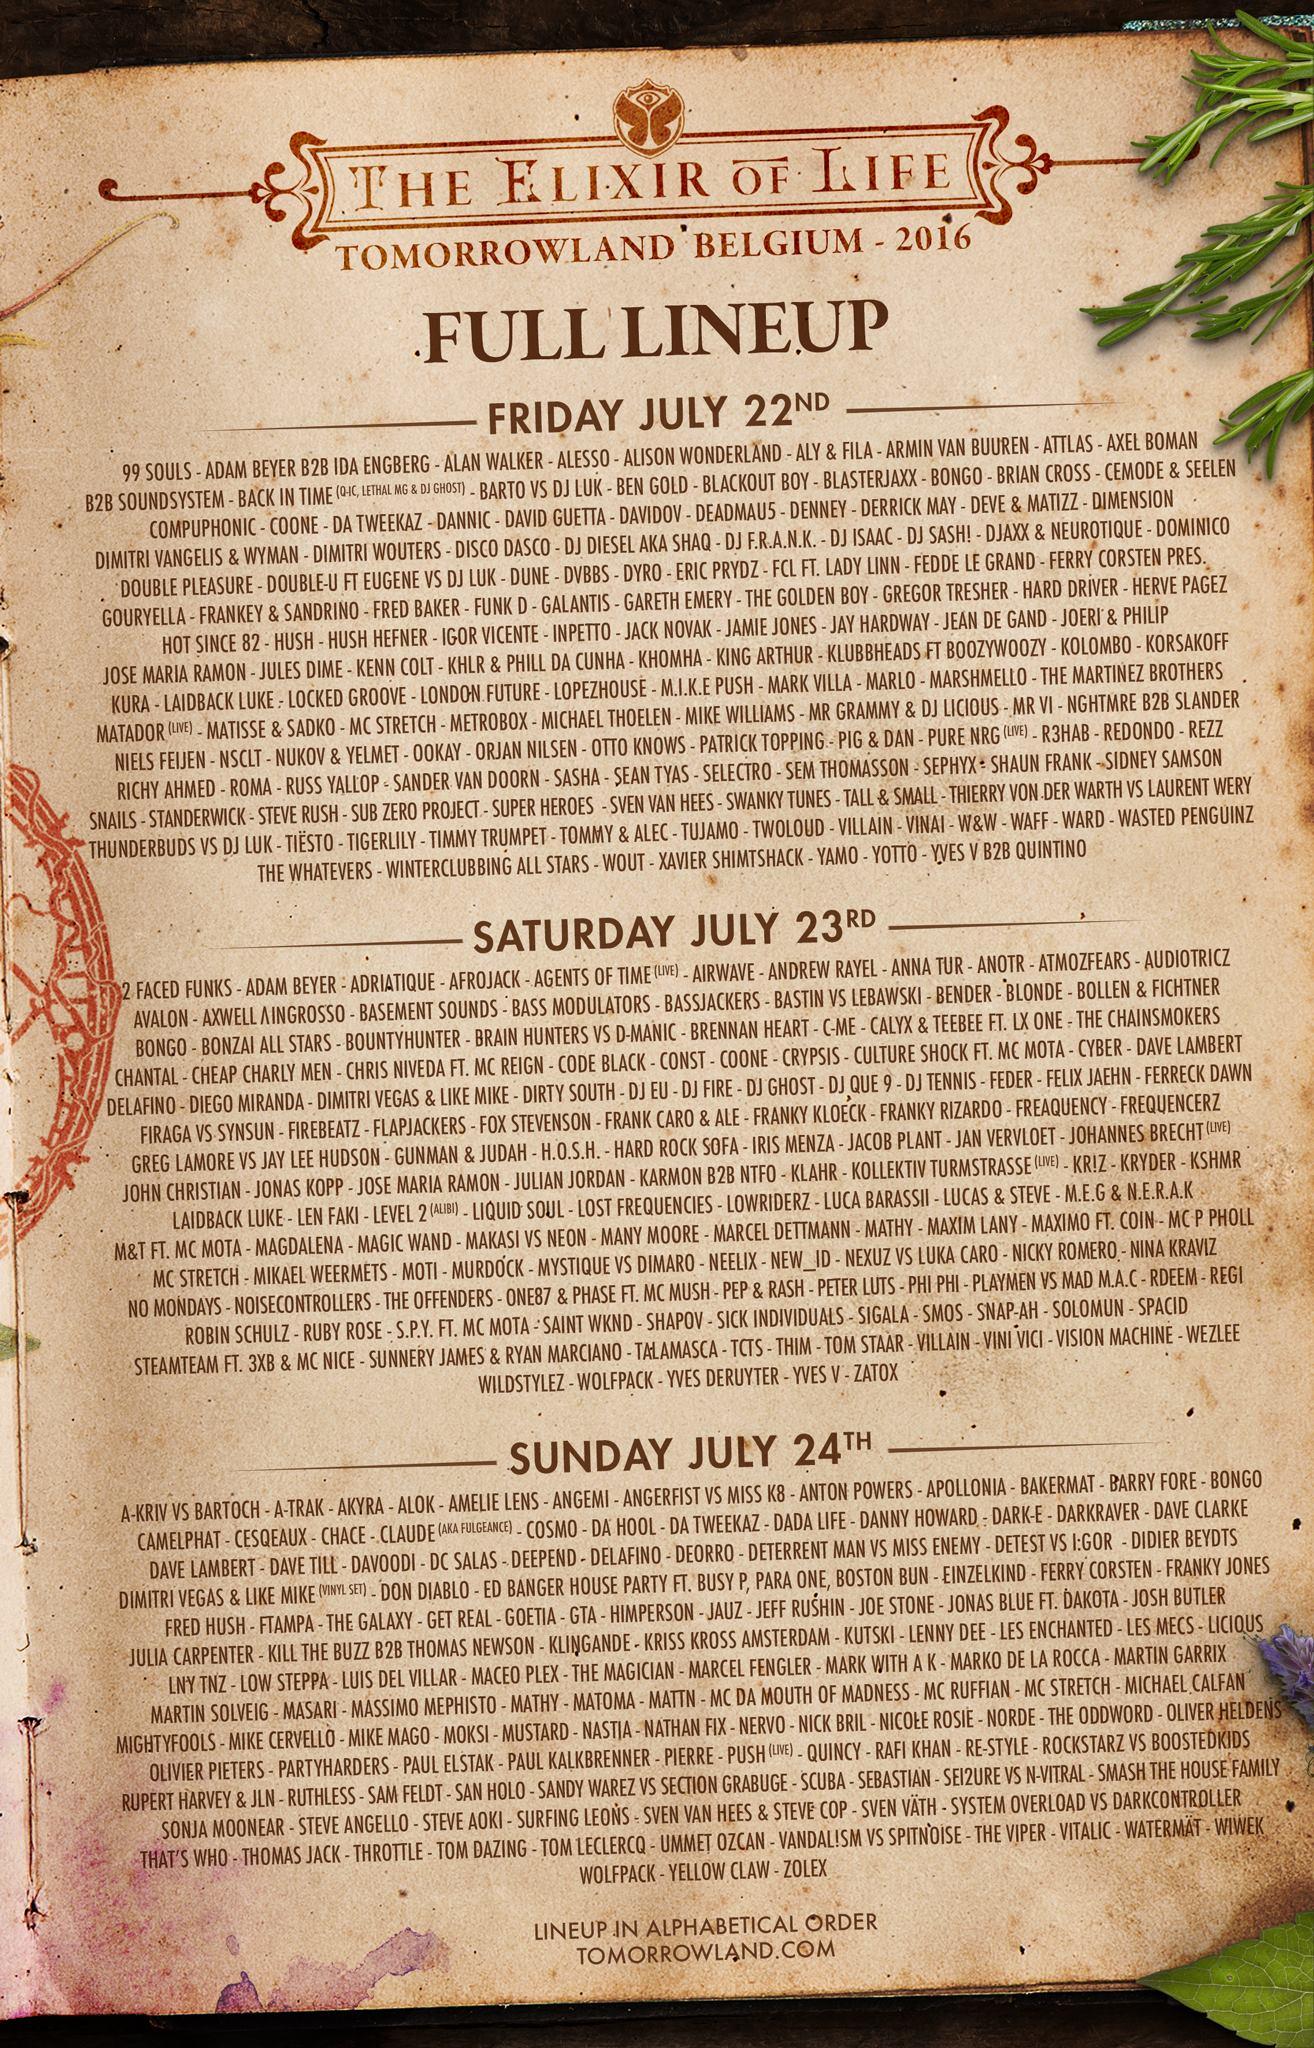 Tomorrowland line up